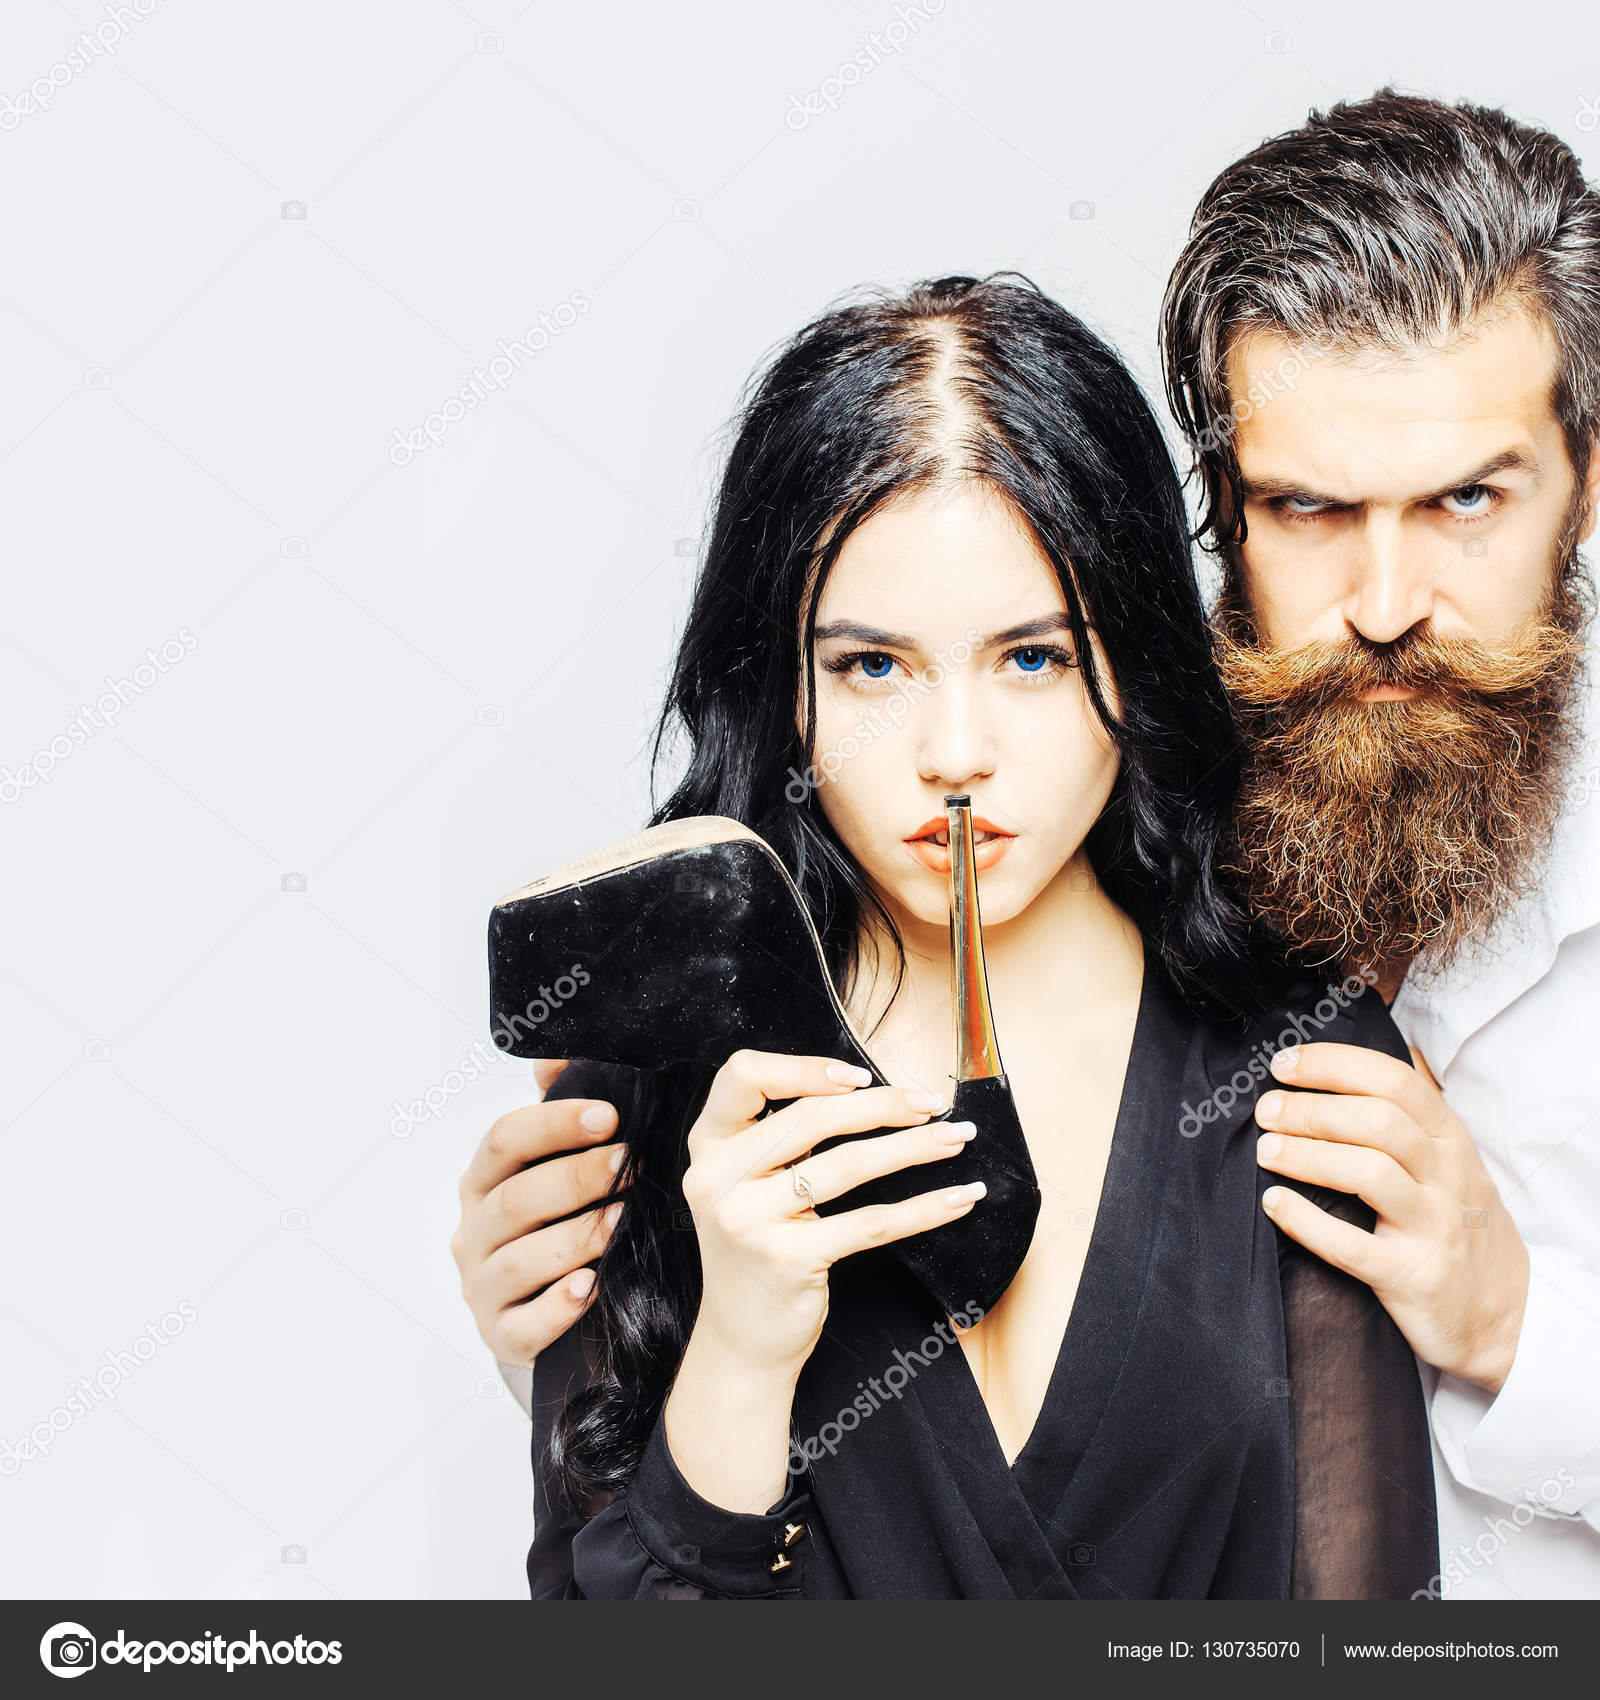 Sexy Couple With Shoe  Stock Photo  Tverdohlibcom 130735070-6150